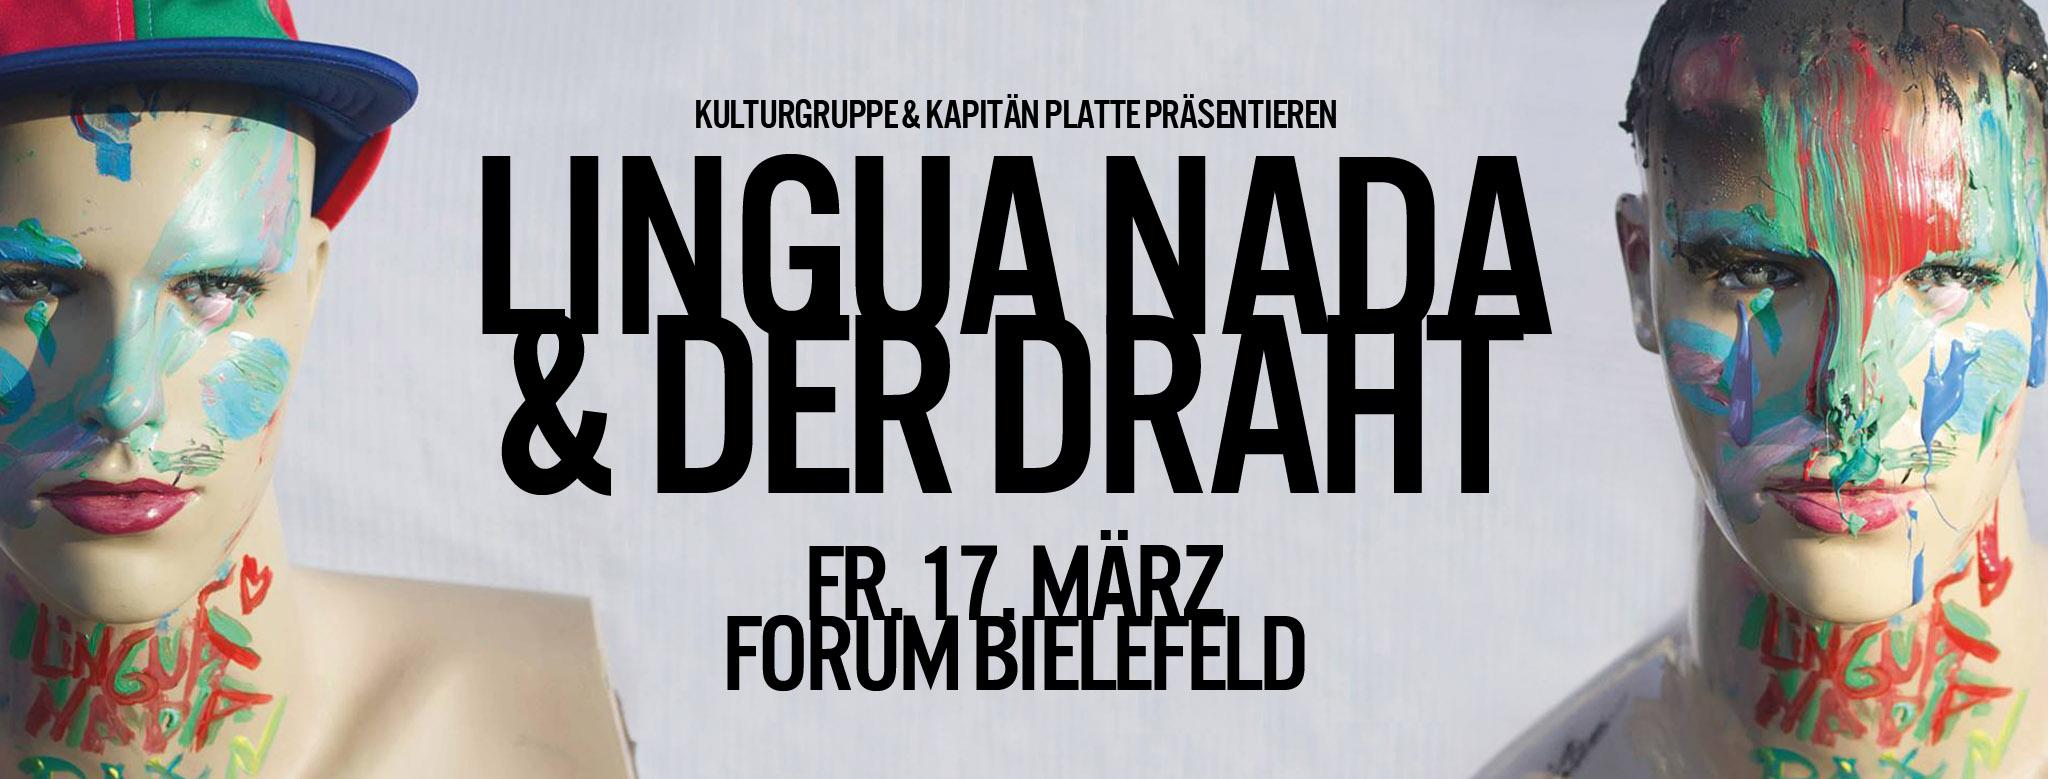 201701_lingua_nada_forum